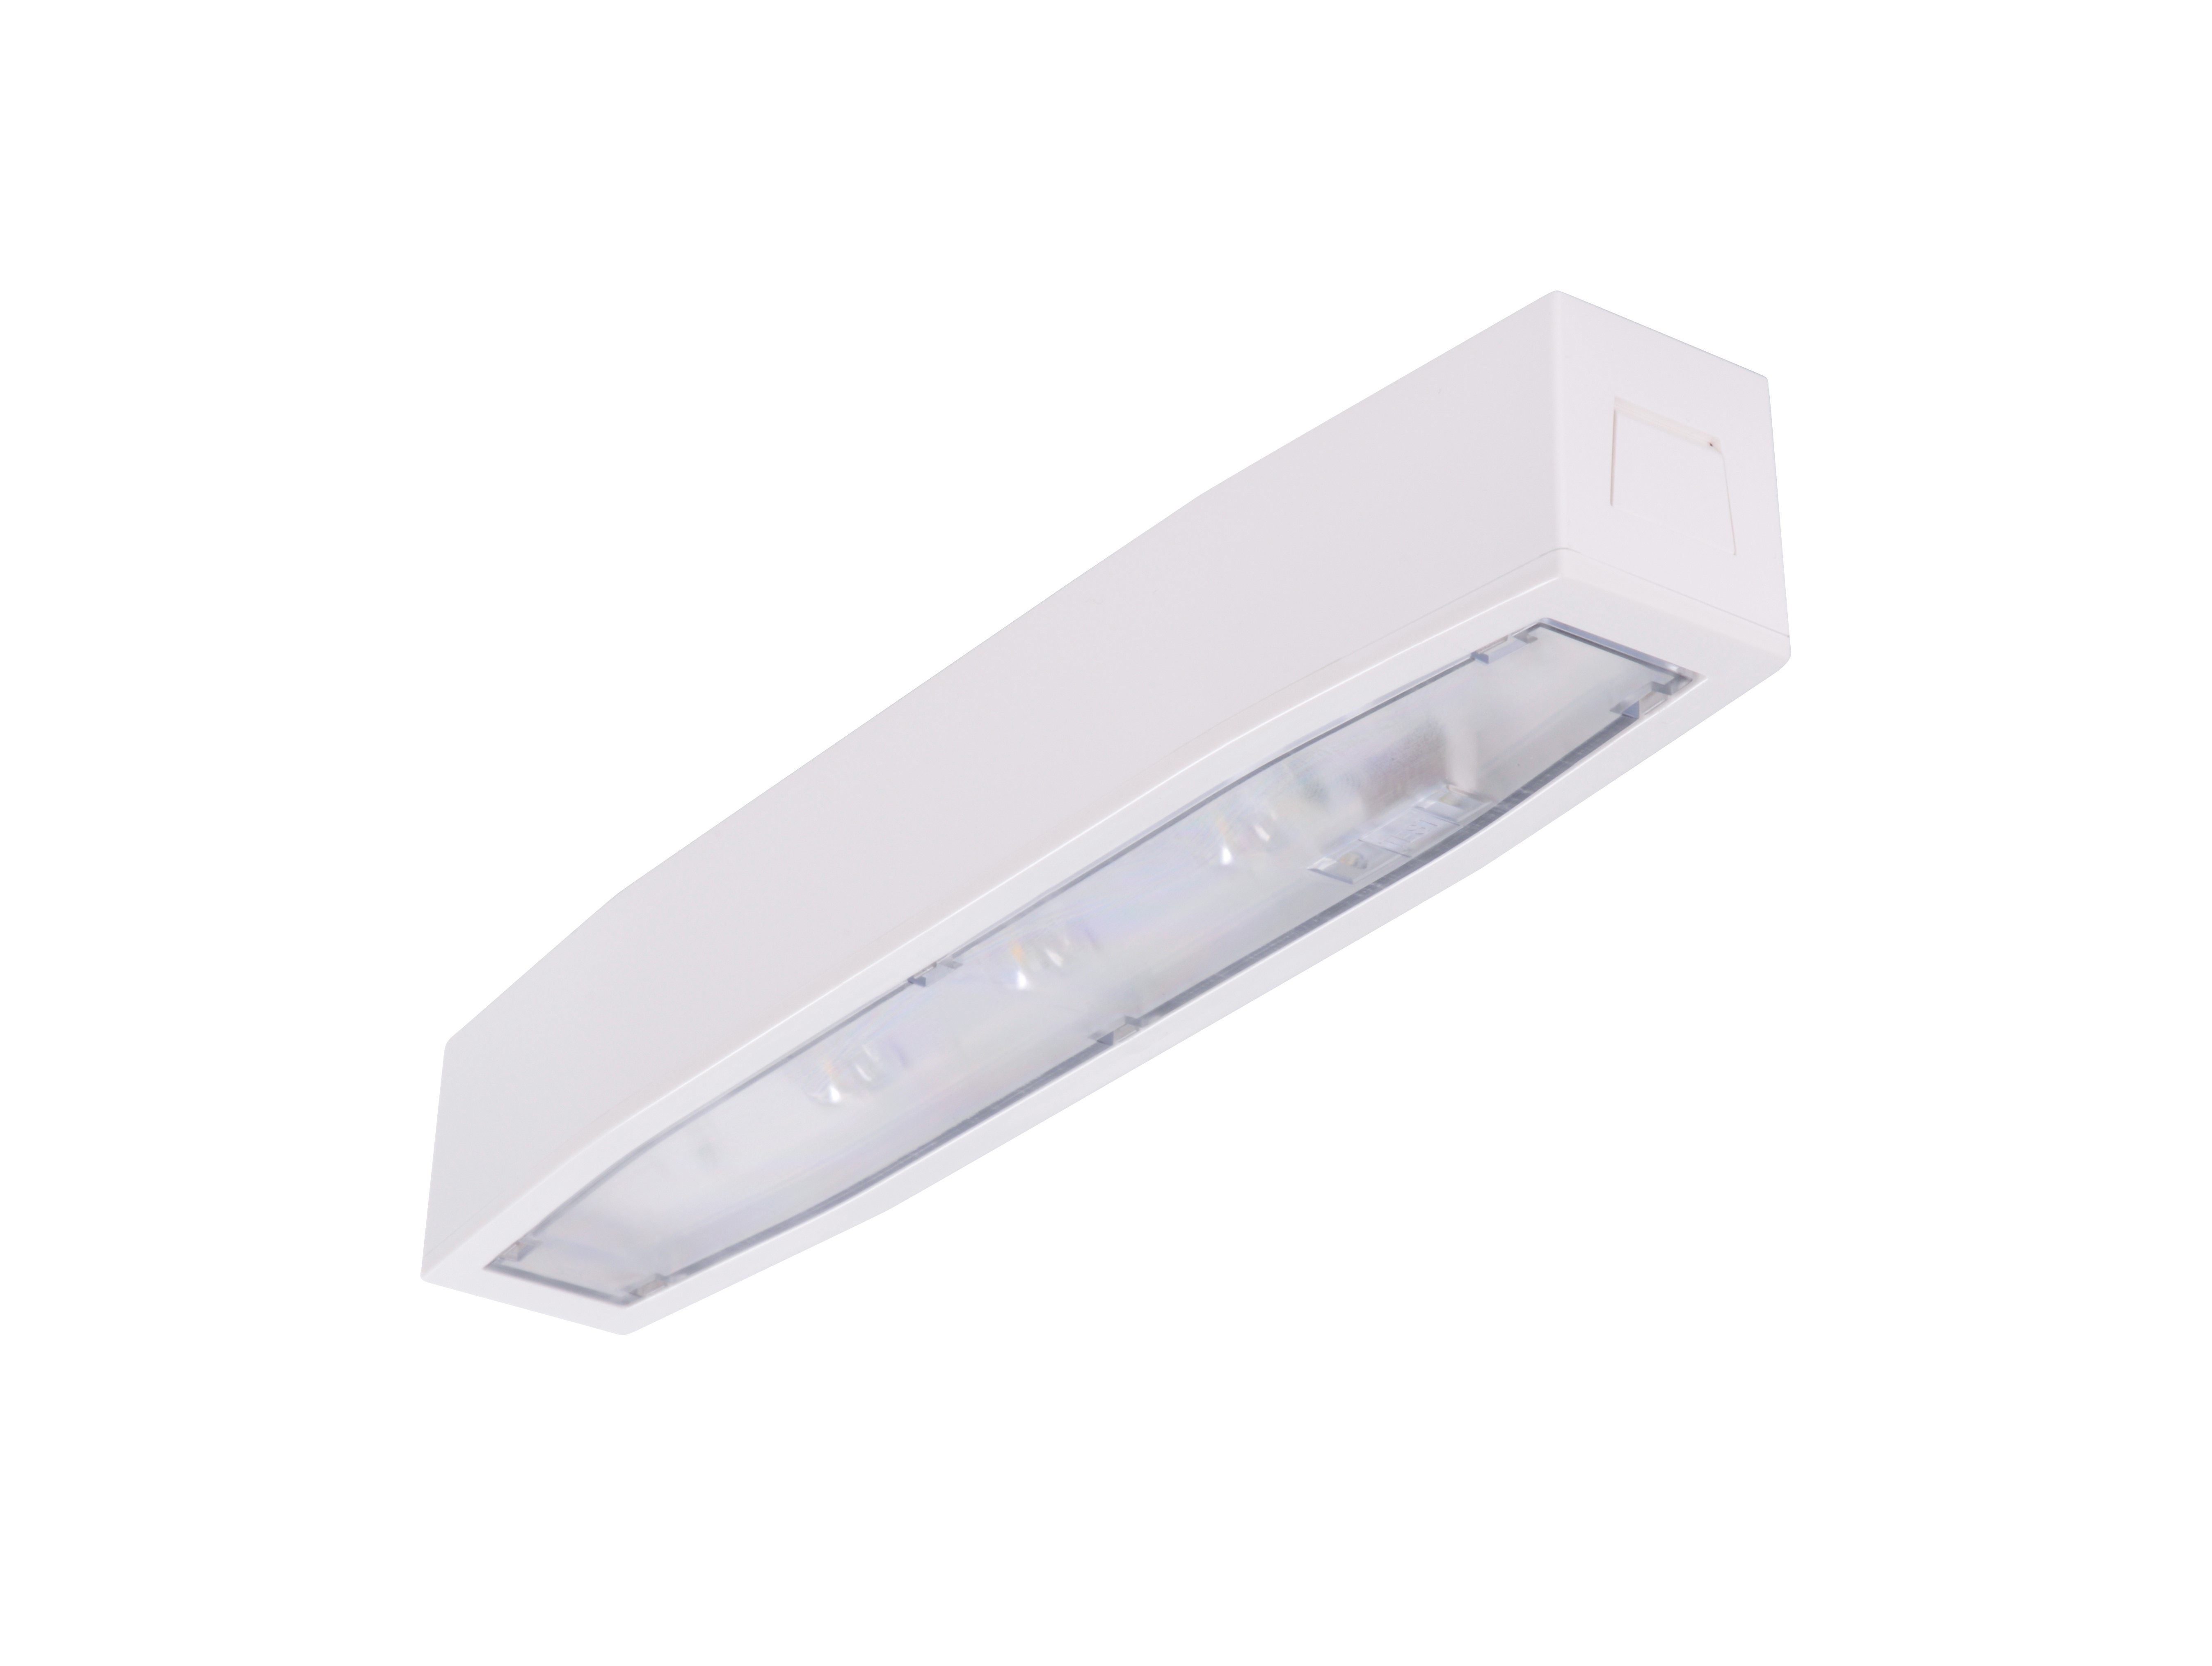 Lampa emergenta led Intelight 94714   3h mentinut test automat 0